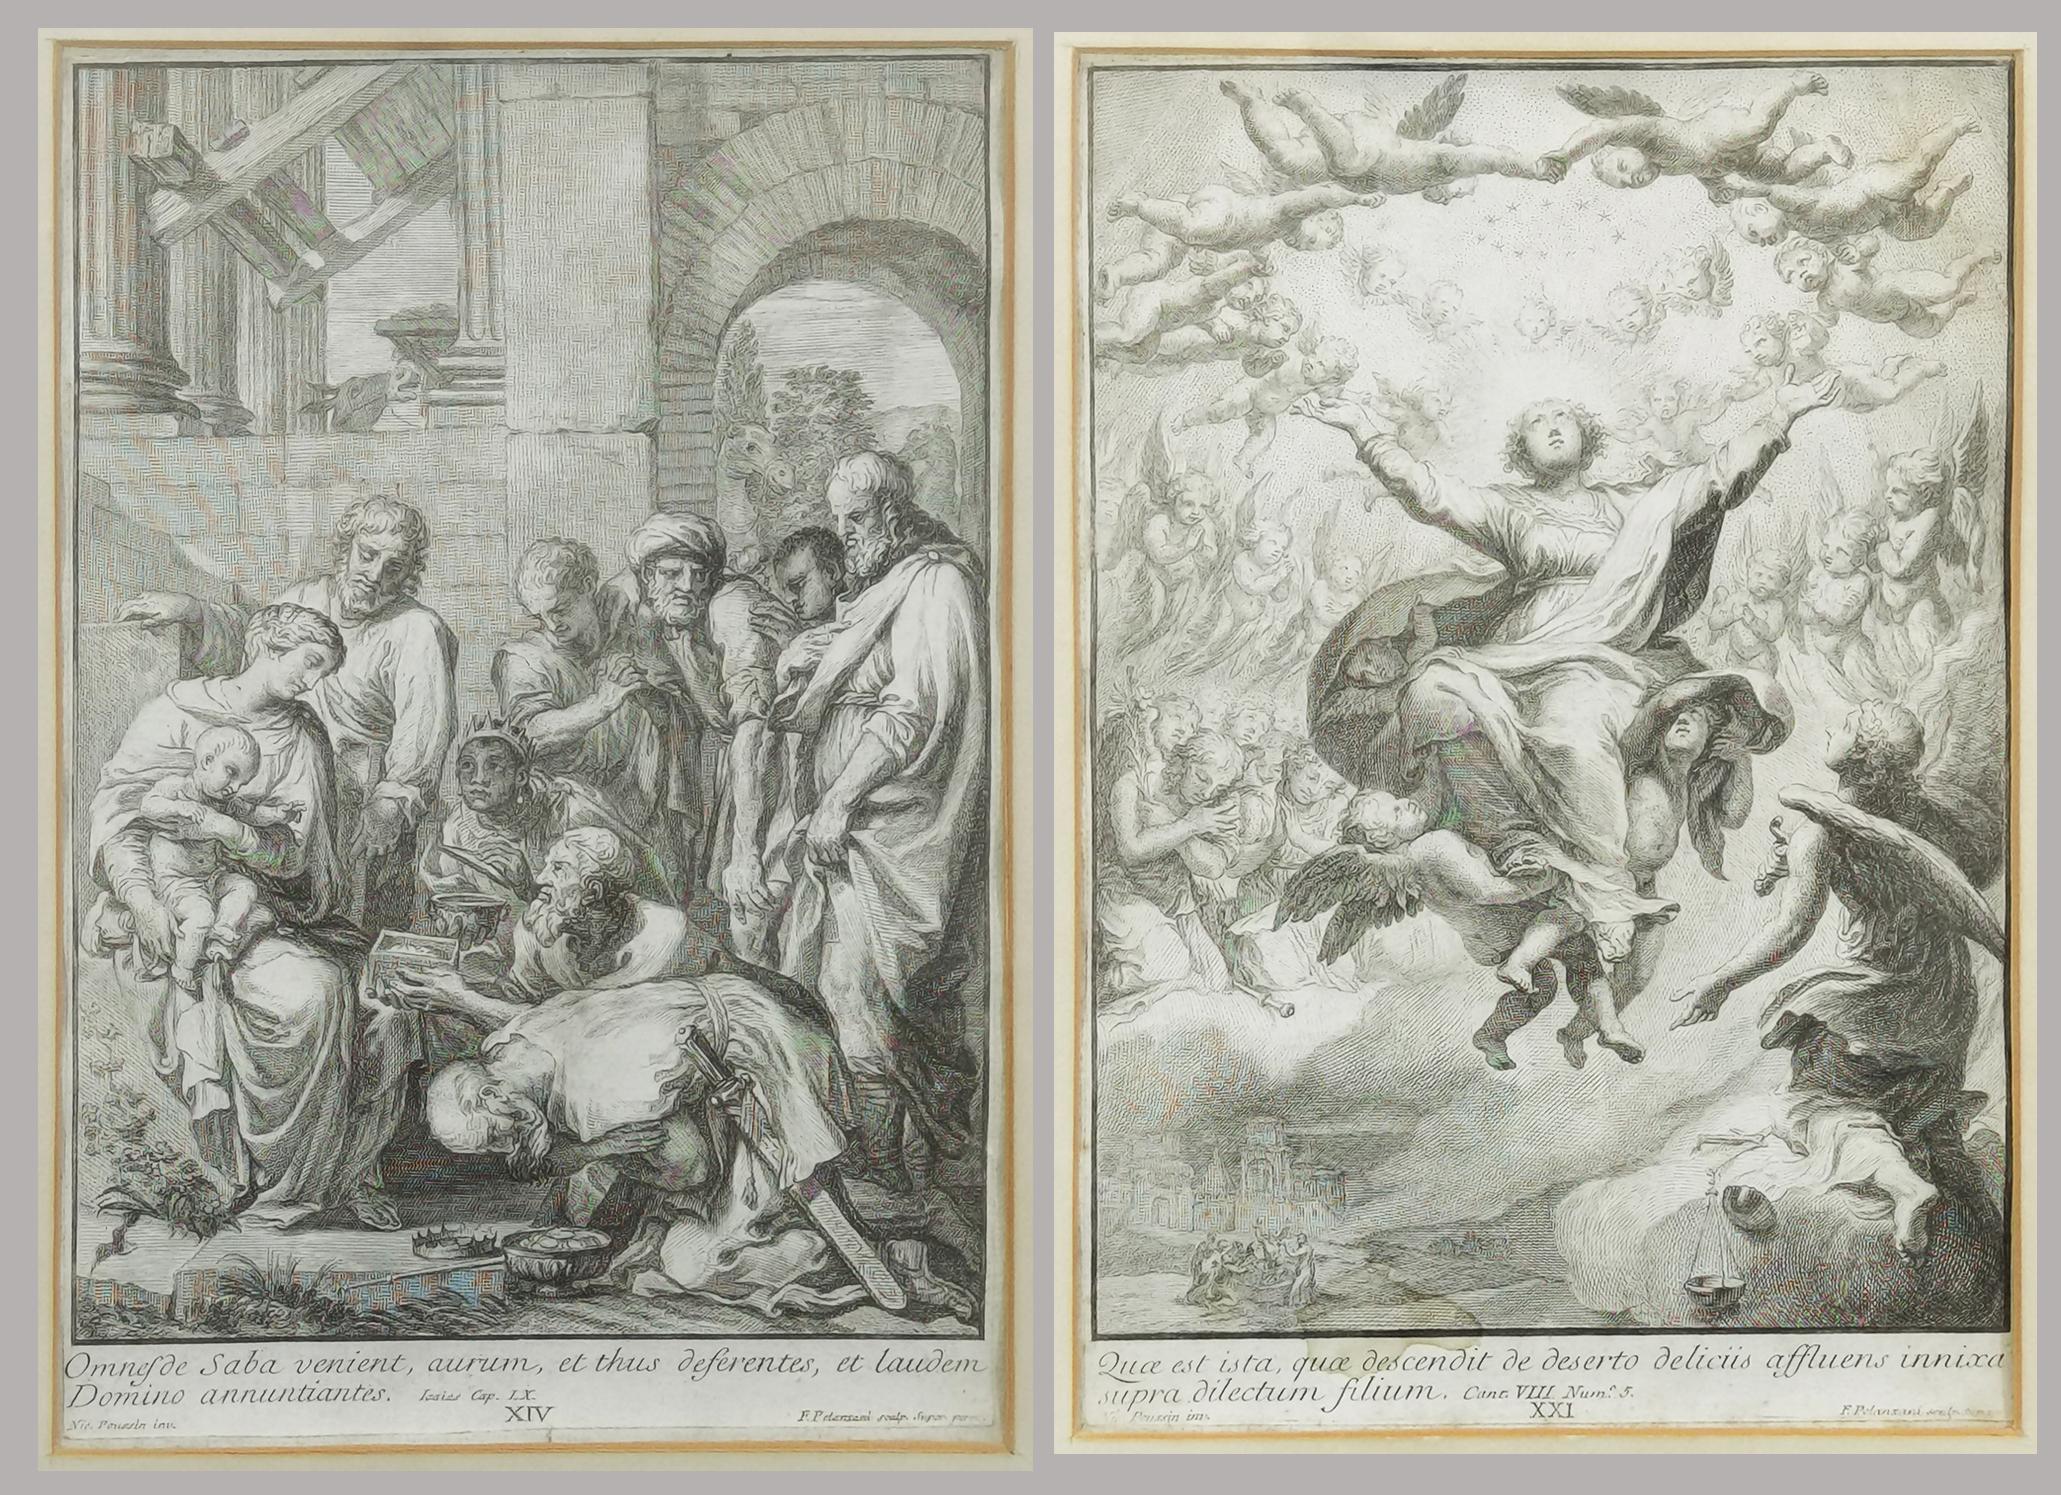 Francesco POLANZANI (1700-ok. 1783) rytował, według: Nicolas POUSSIN (1594-1665)